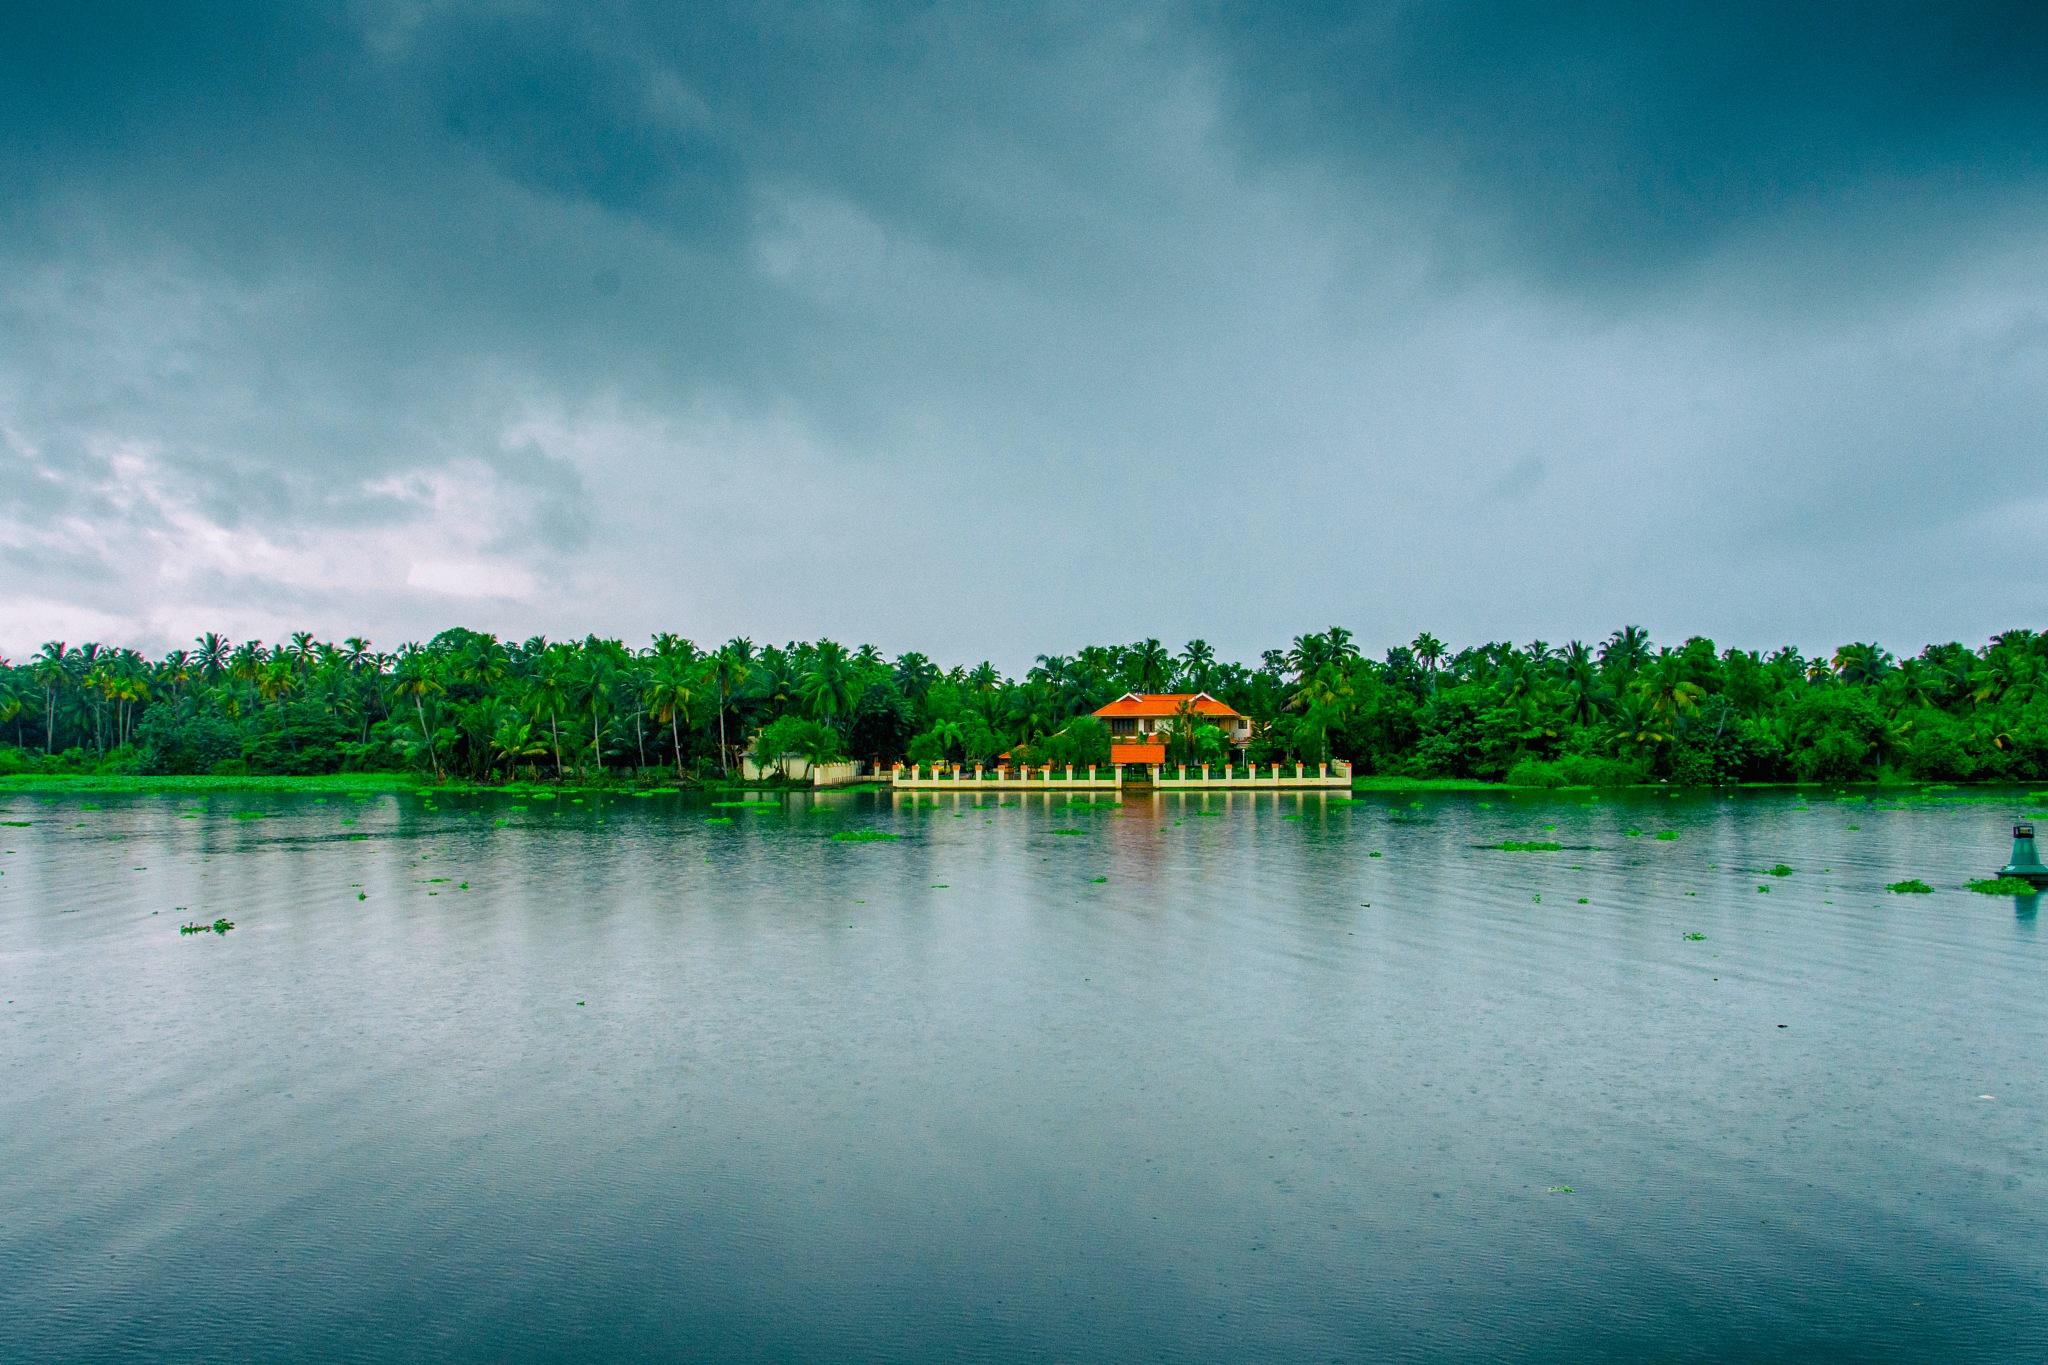 Landscape Photography by HABEEB RAHMAN